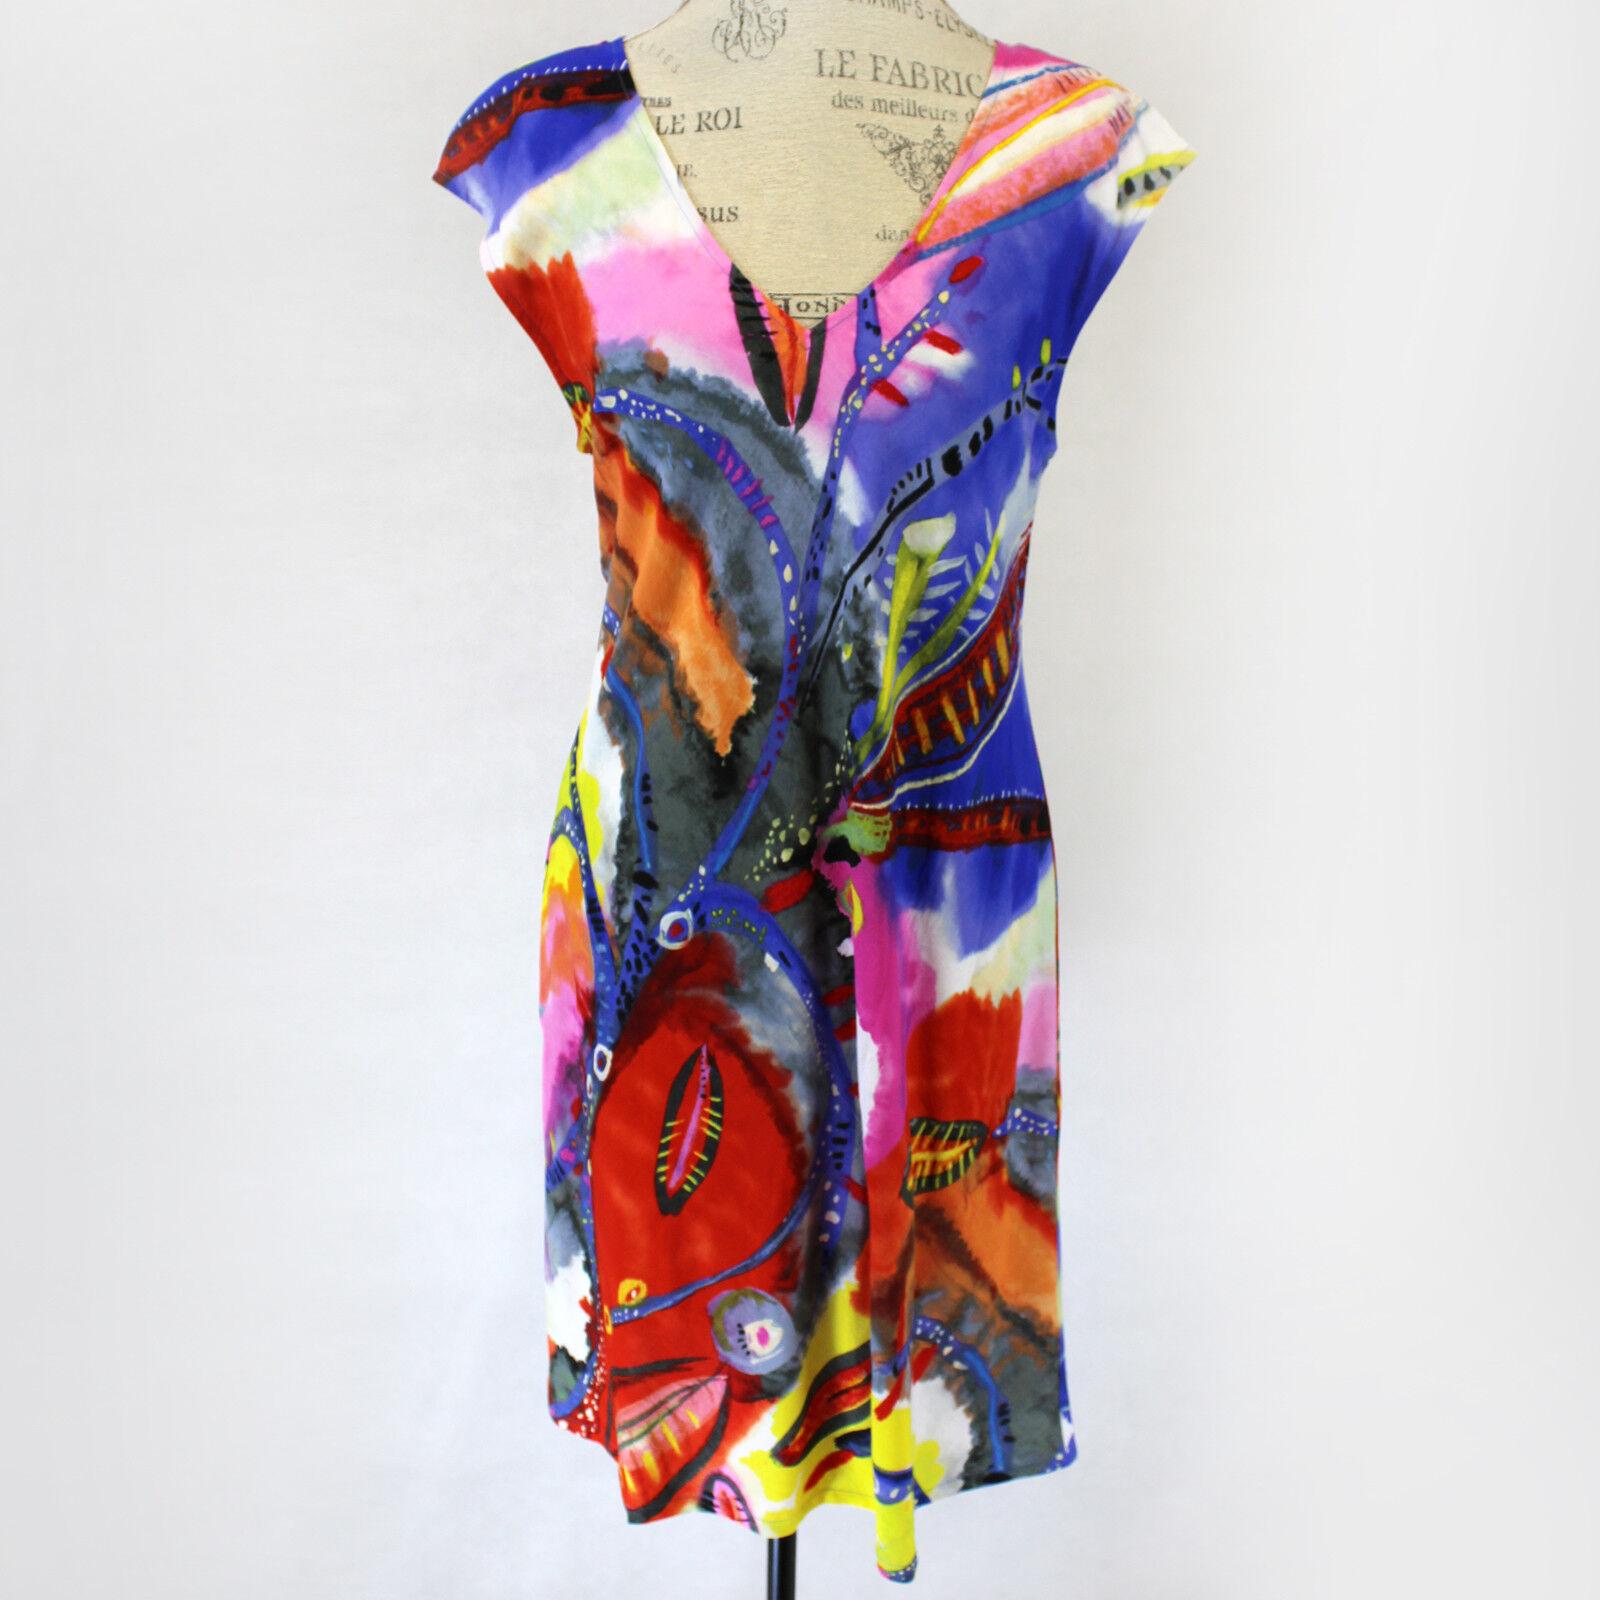 NEW Jams World Sherry Dress SECRET Crush Print Sundress XL Made in USA